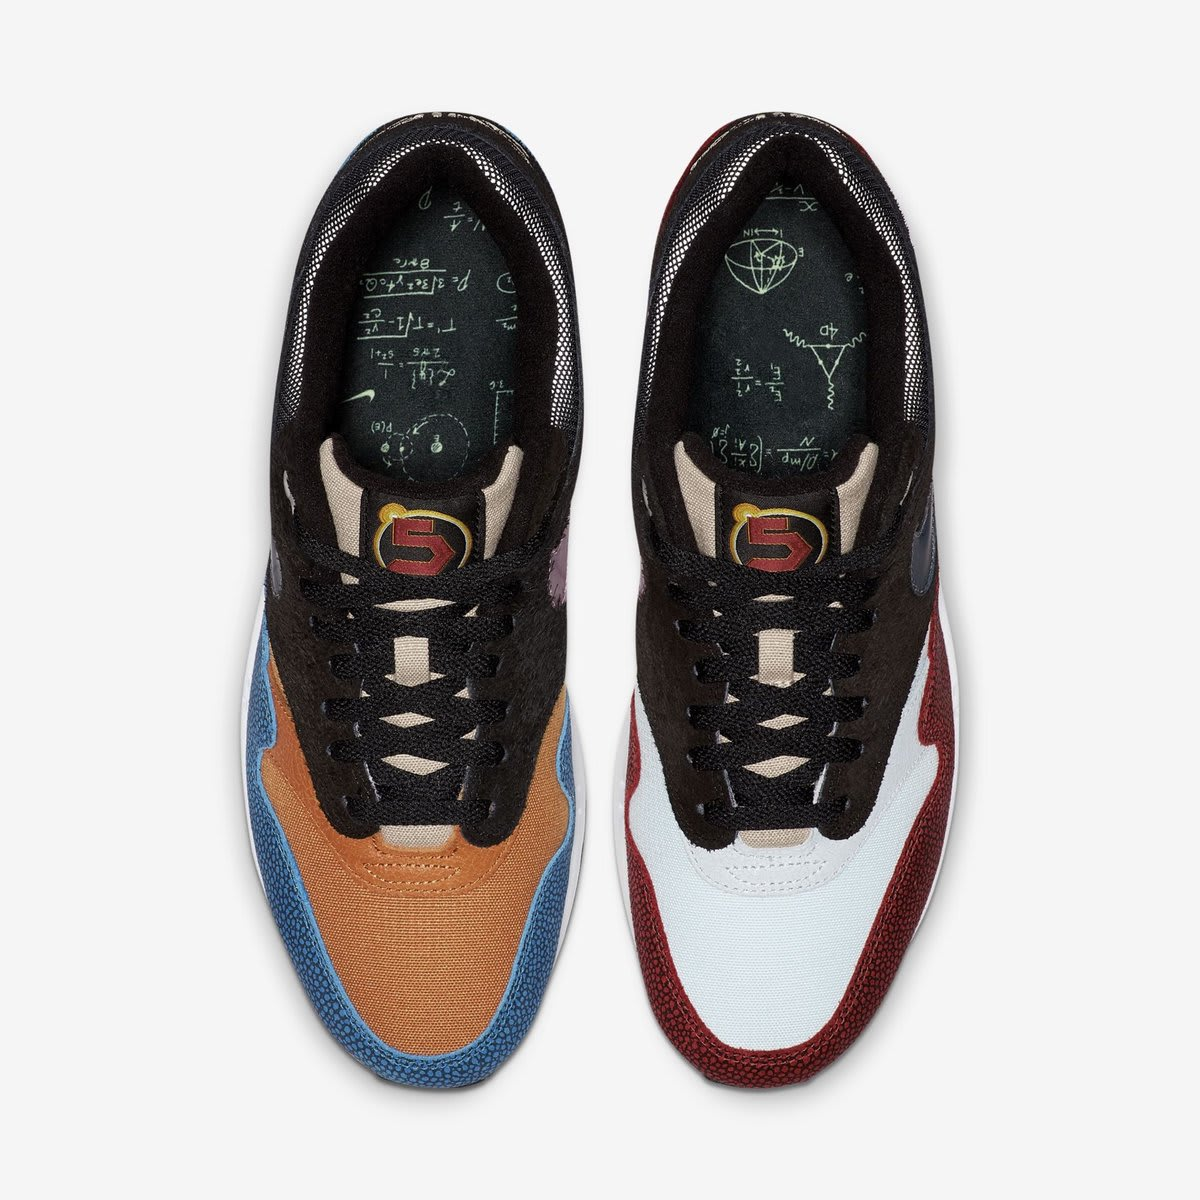 De'Aaron Fox x Nike Air Max 1 'Swipa' (Top)